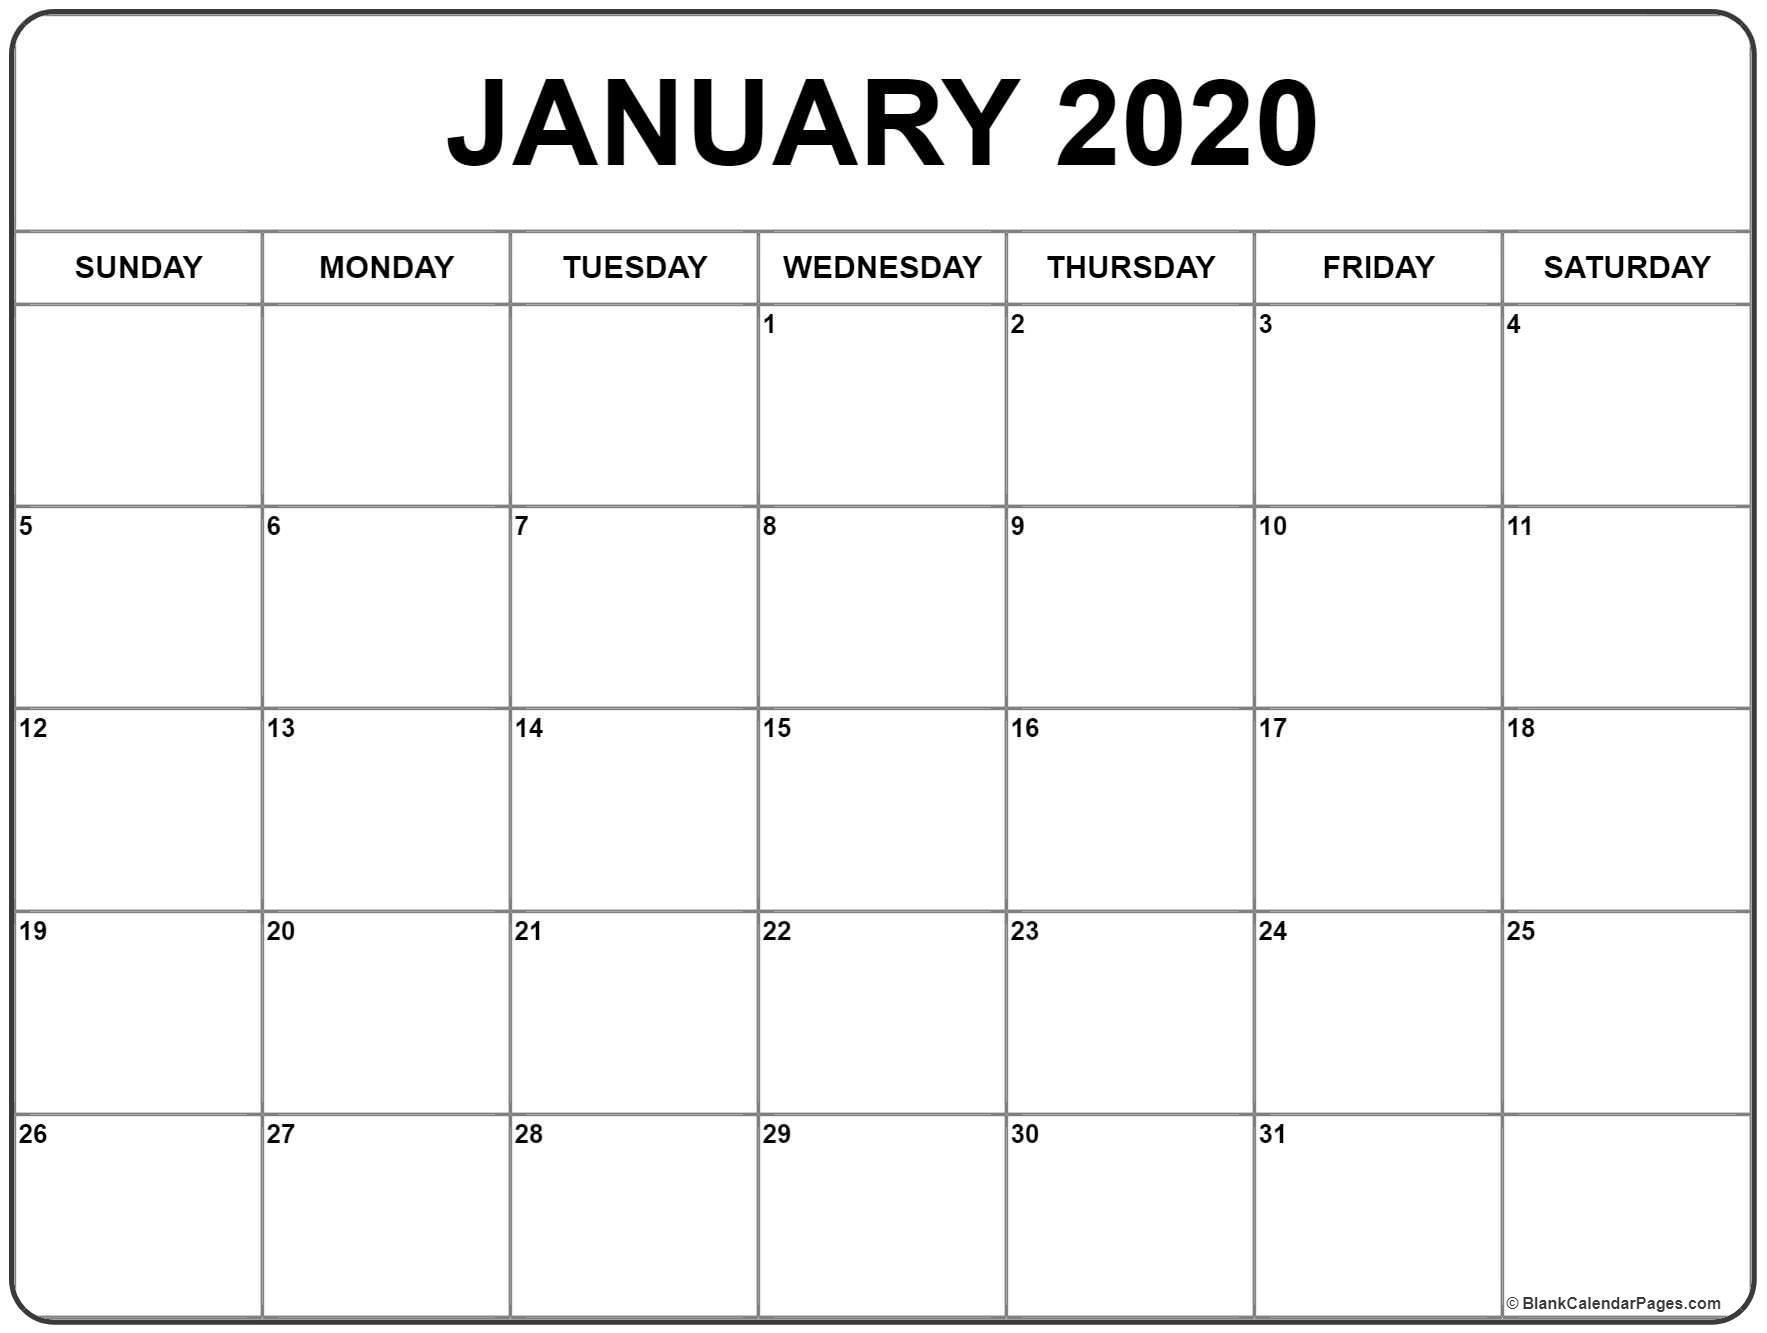 Islamic Calendar 2020 – Printable Week Calendar-January 2020 Urdu Calendar